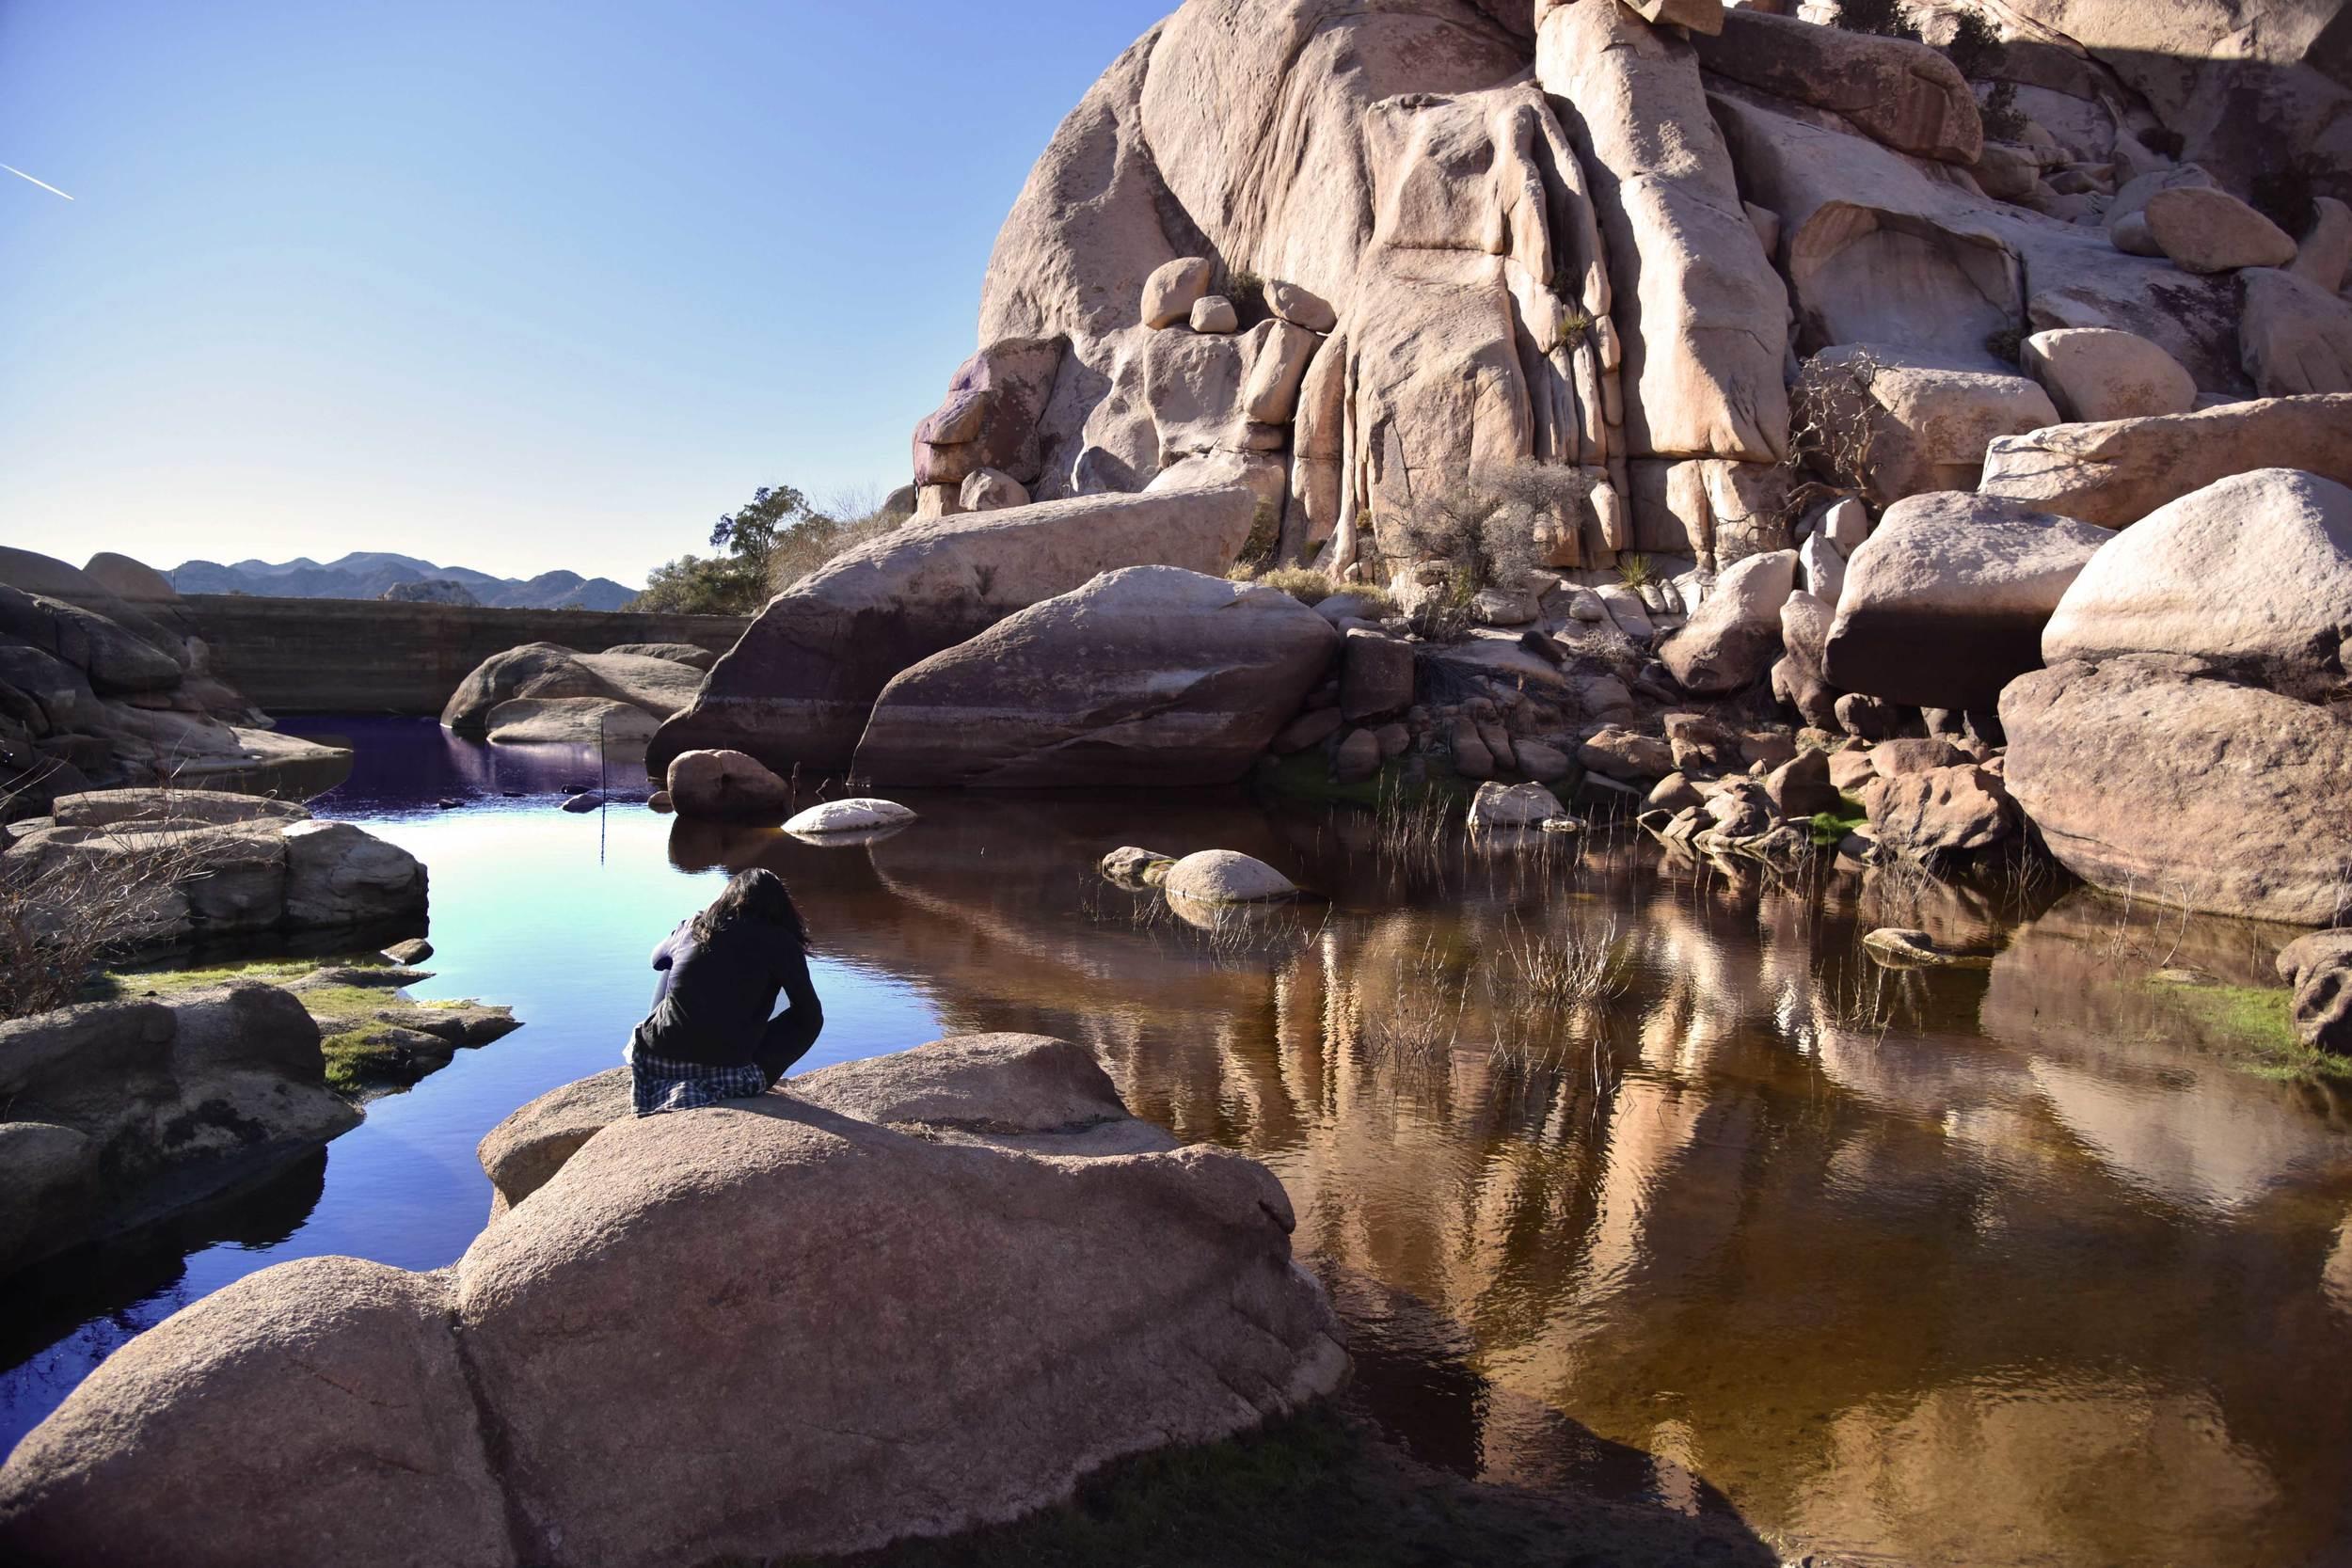 Barker Dam,Joshua Tree National Park, Southern California, USA. Image©thingstodot.com